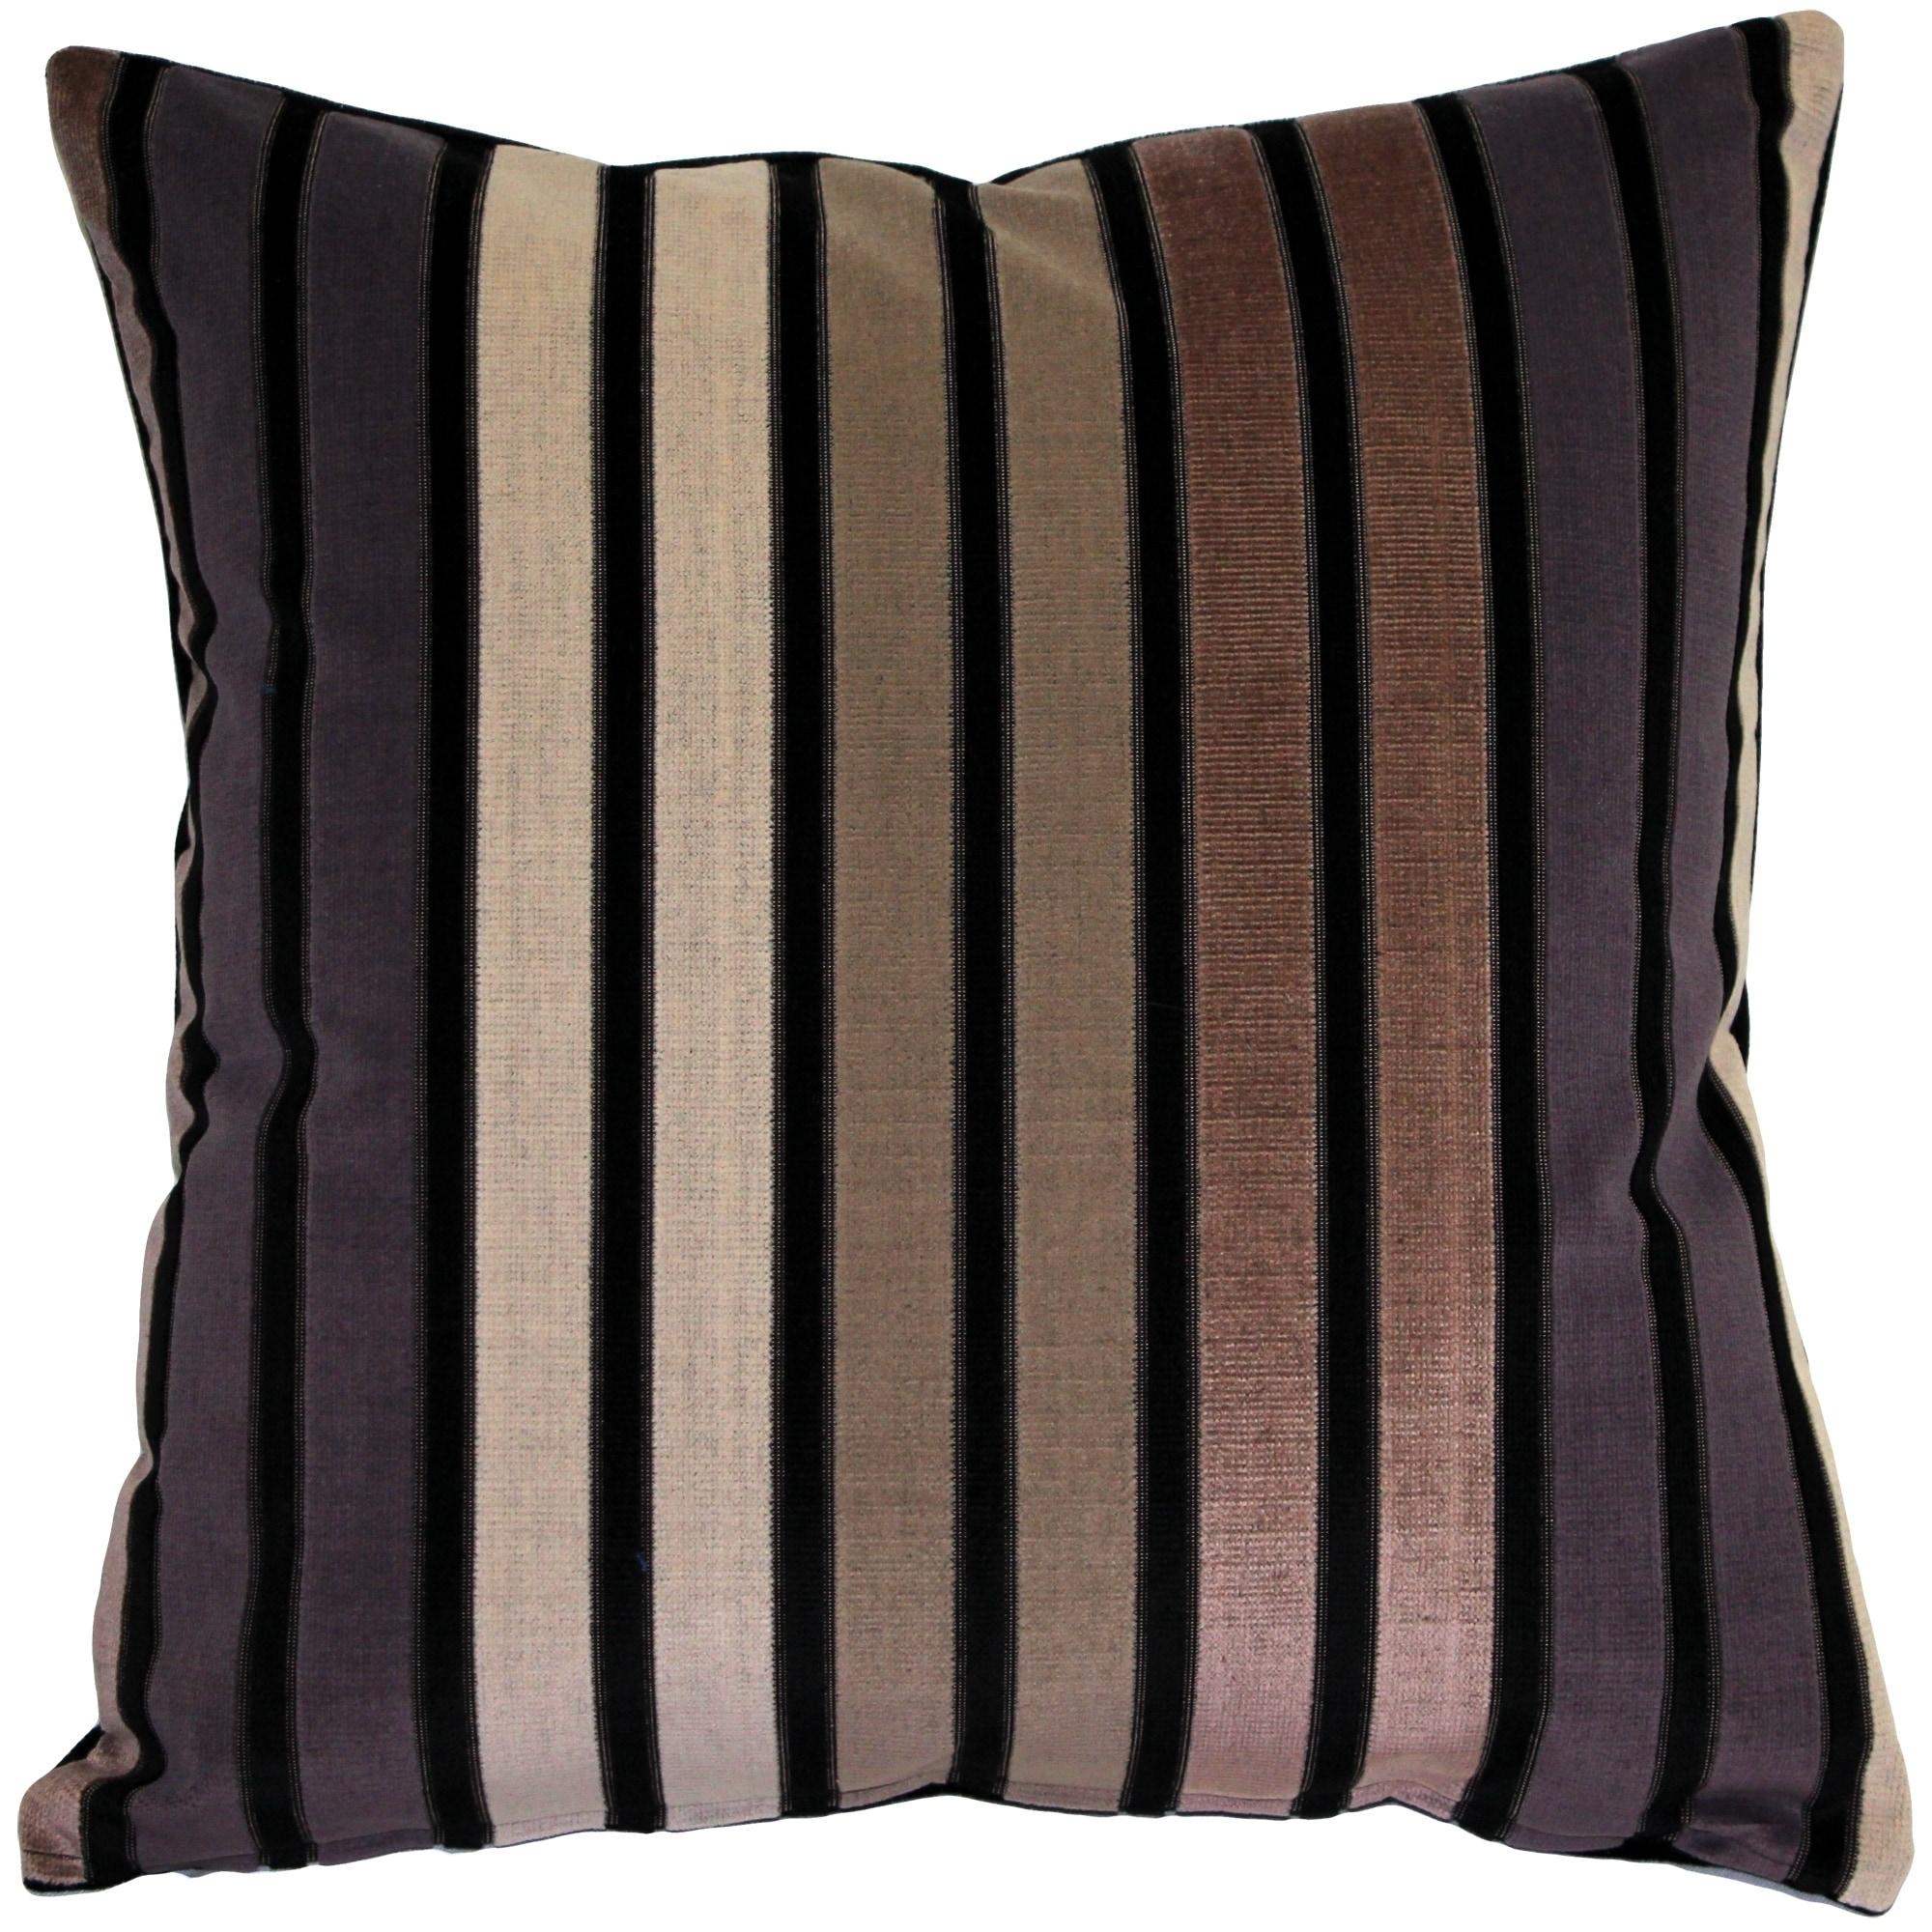 Pillow Decor - Amethyst Stripes Throw Pillow 20x20